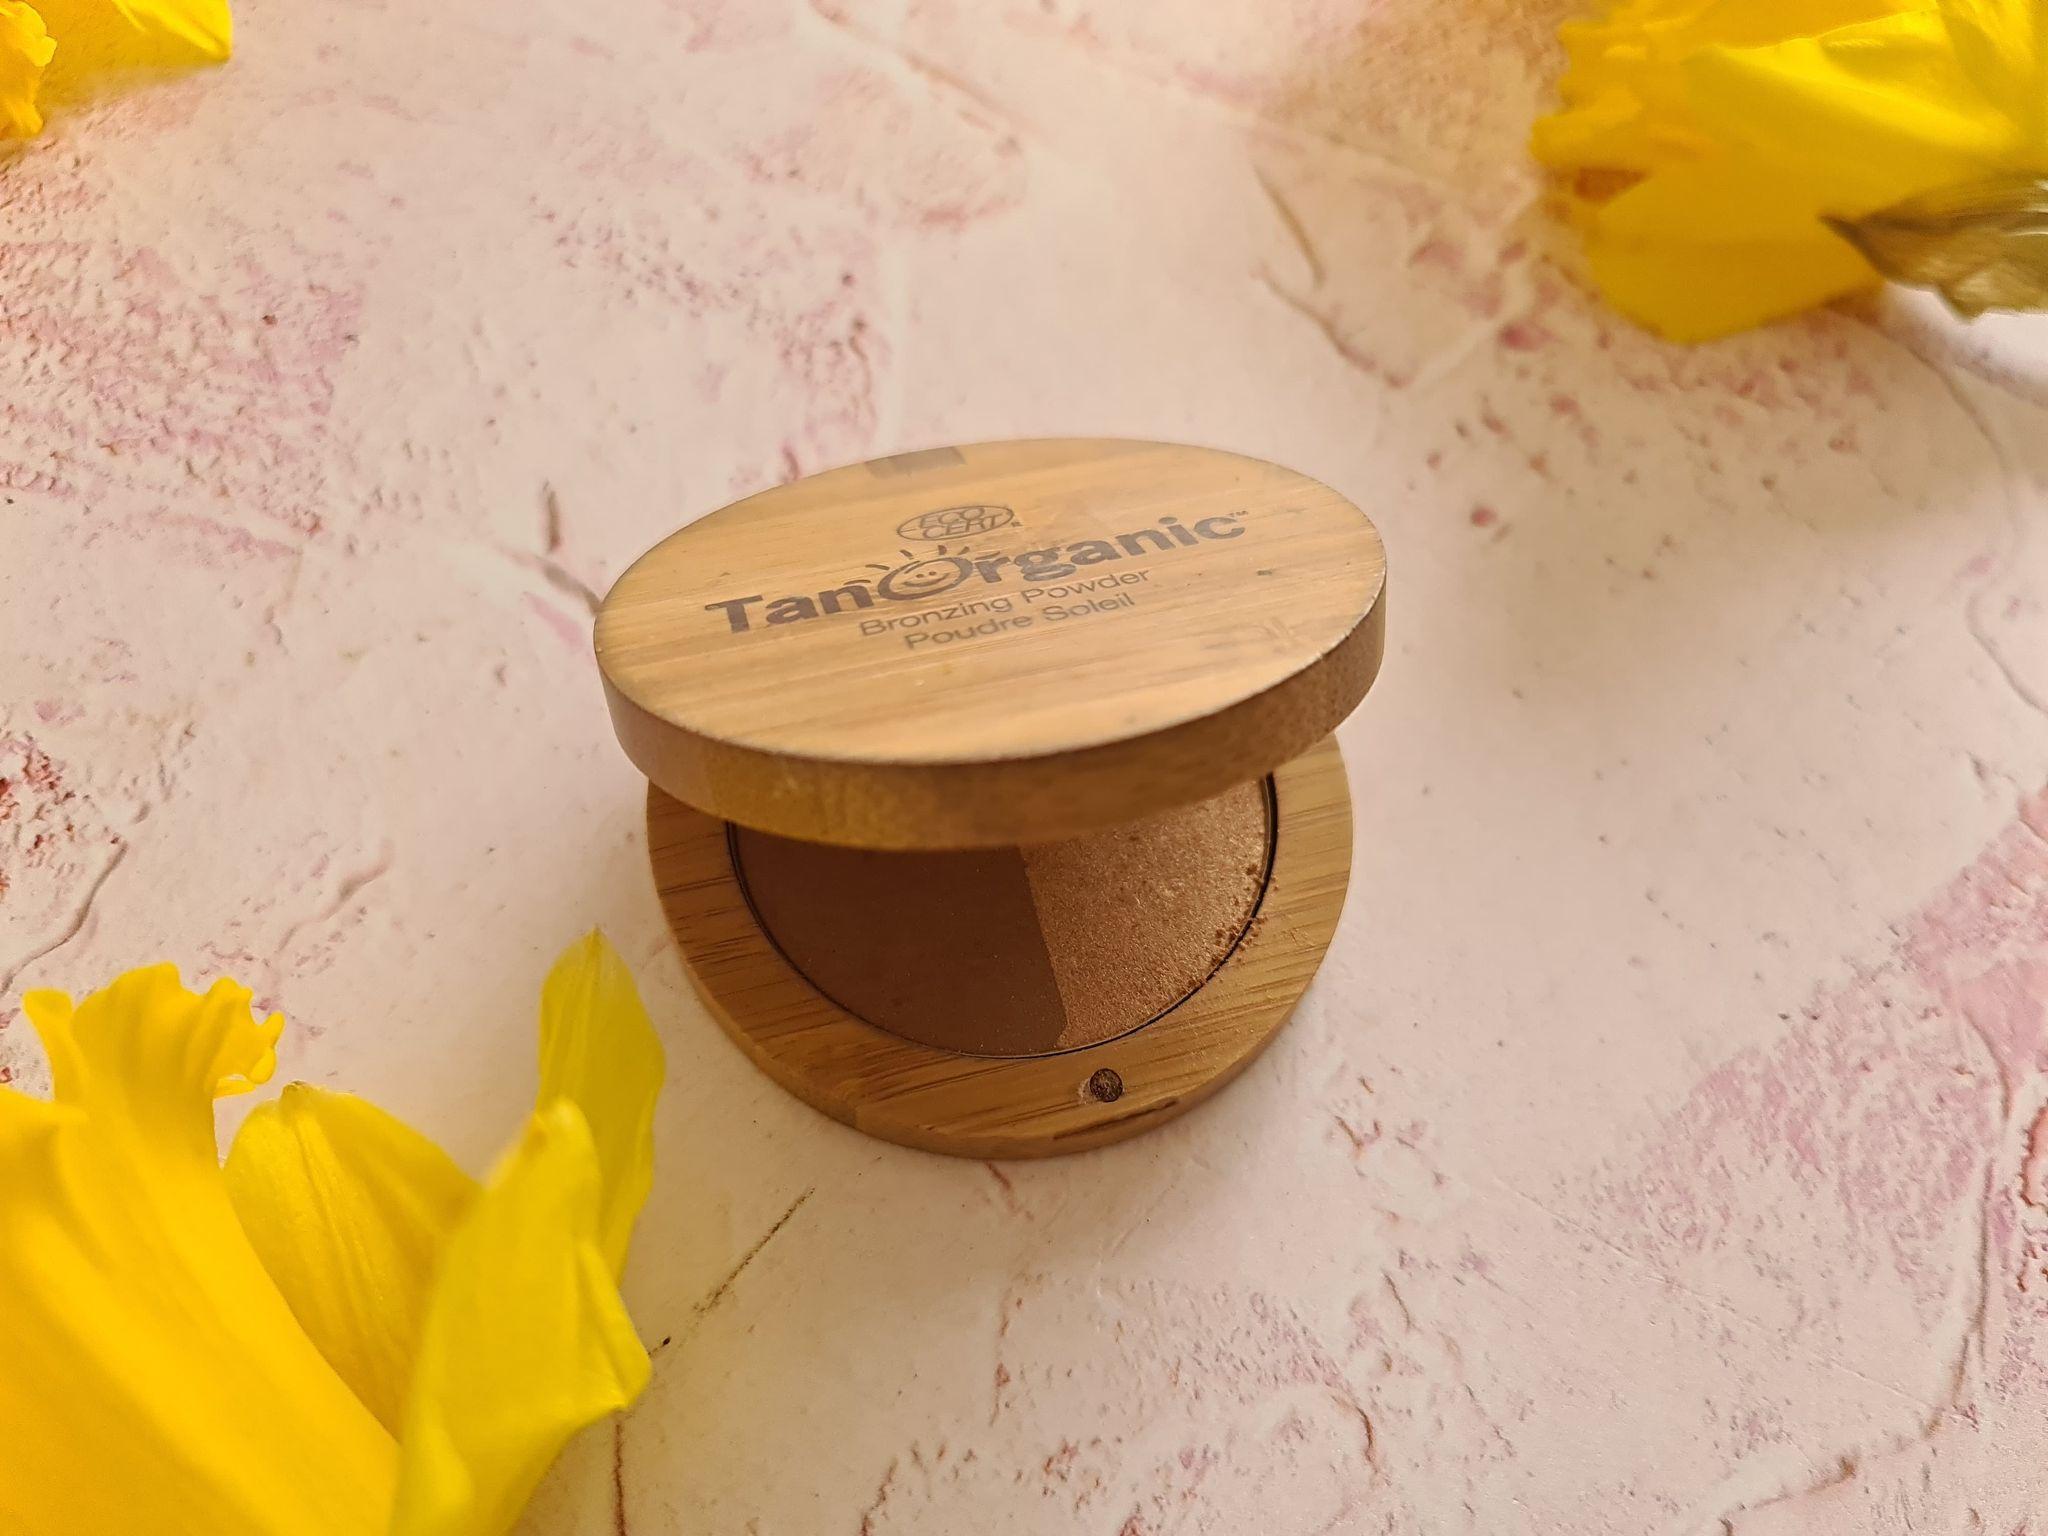 TanOrganic Duo Bronzer review